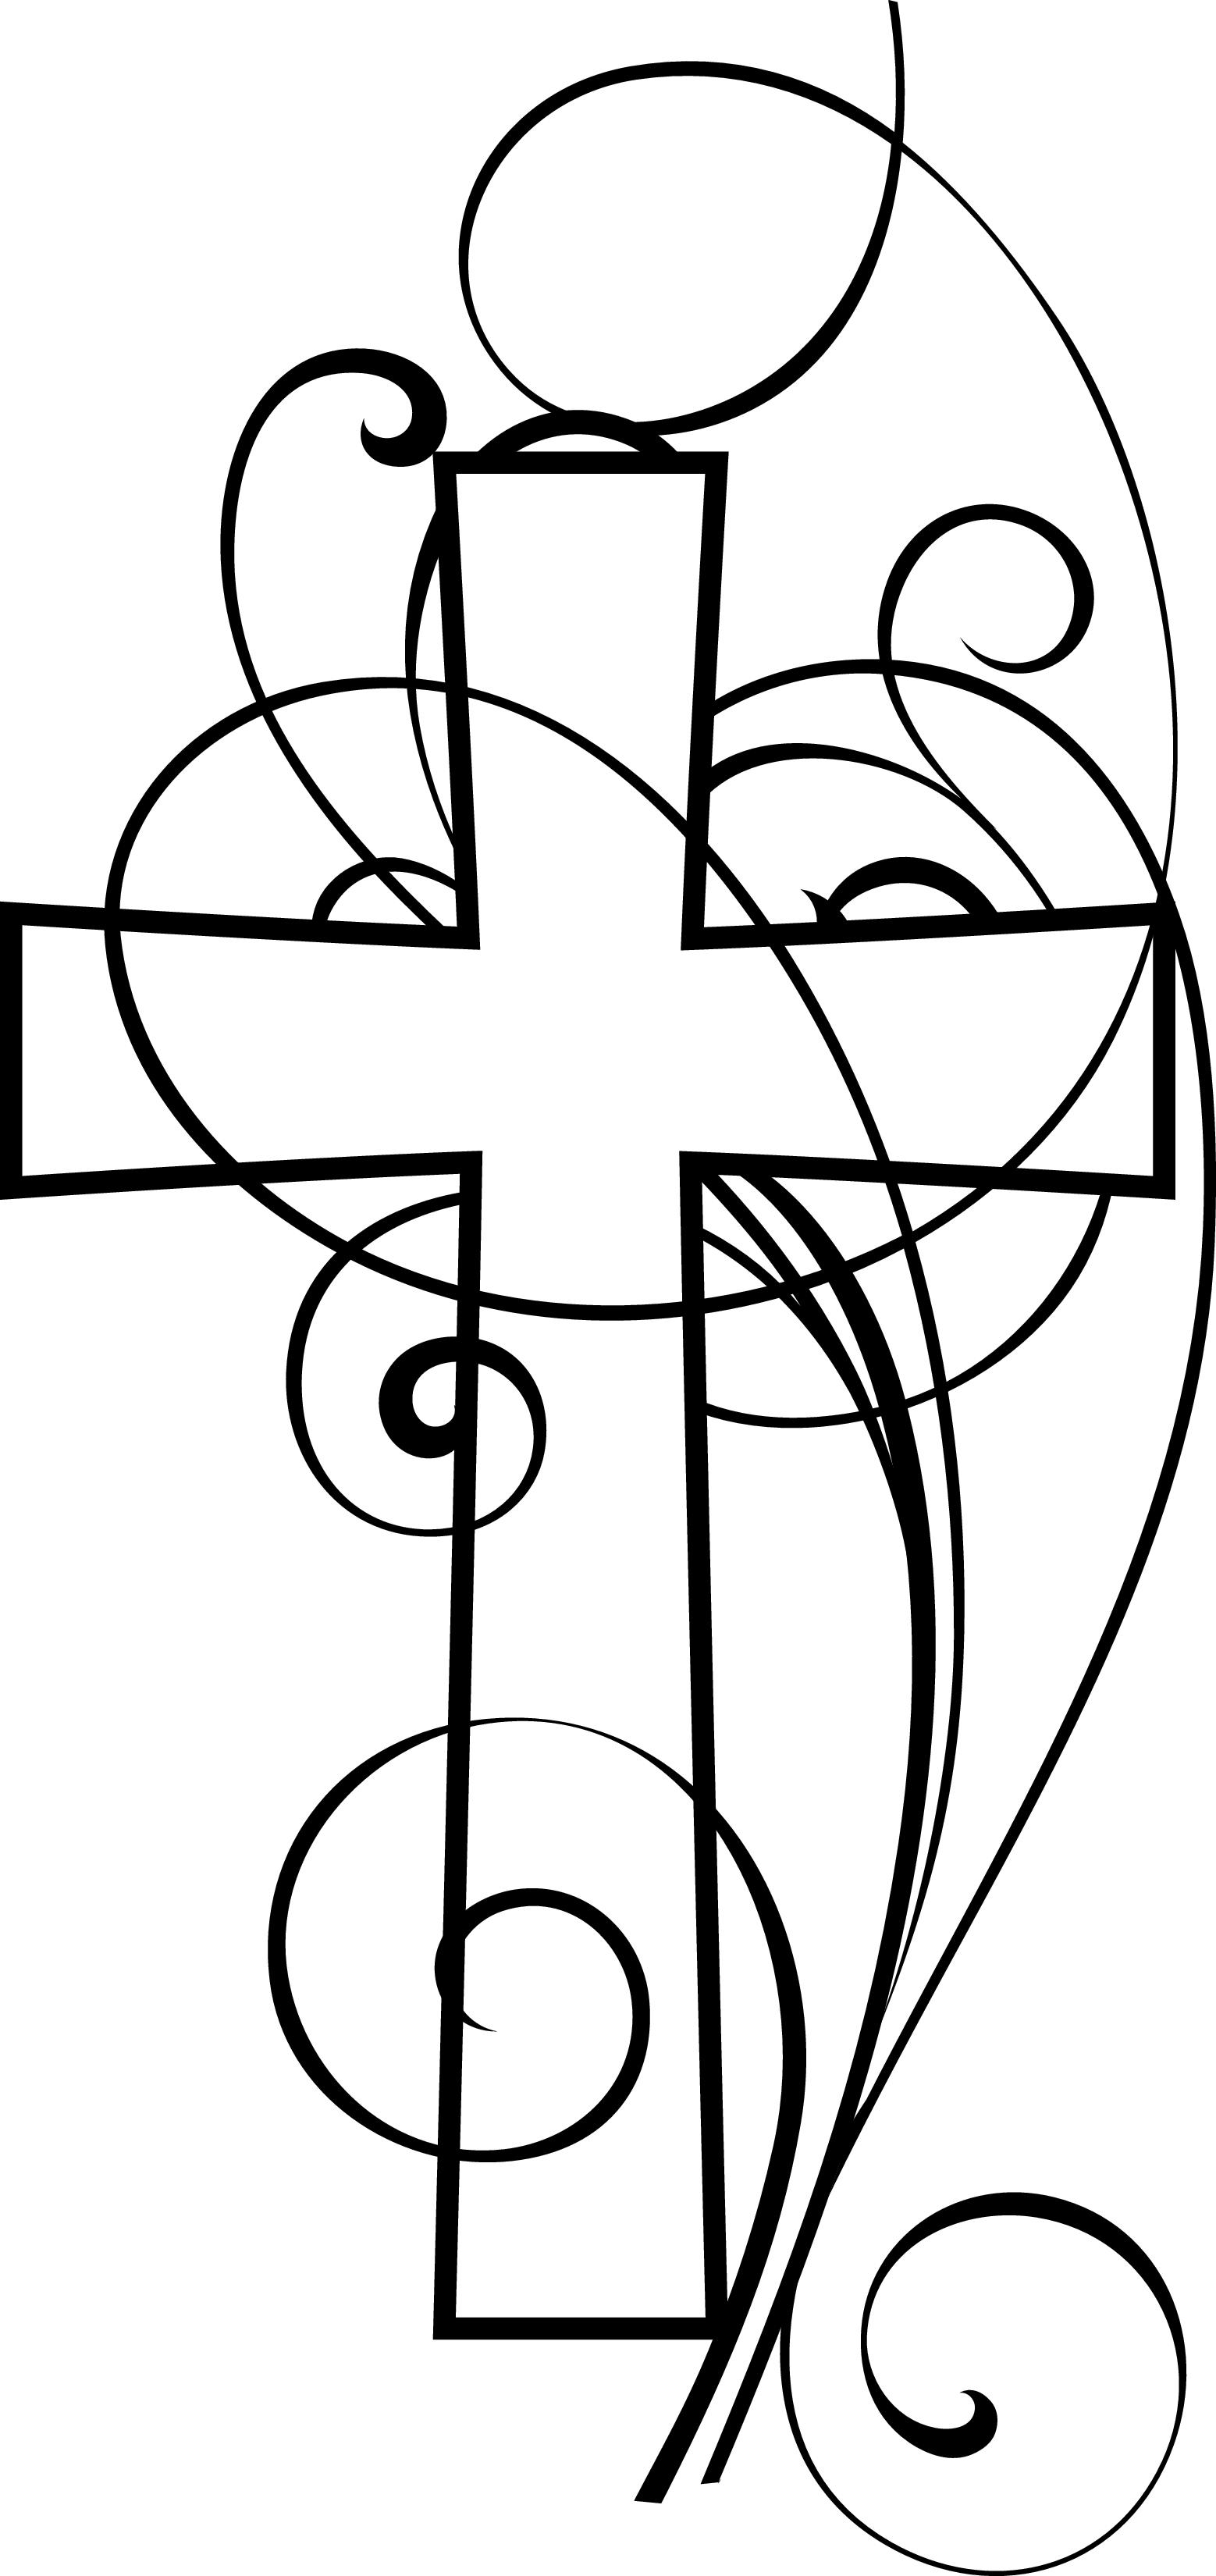 1558x3300 Religious Clip Art Black And White